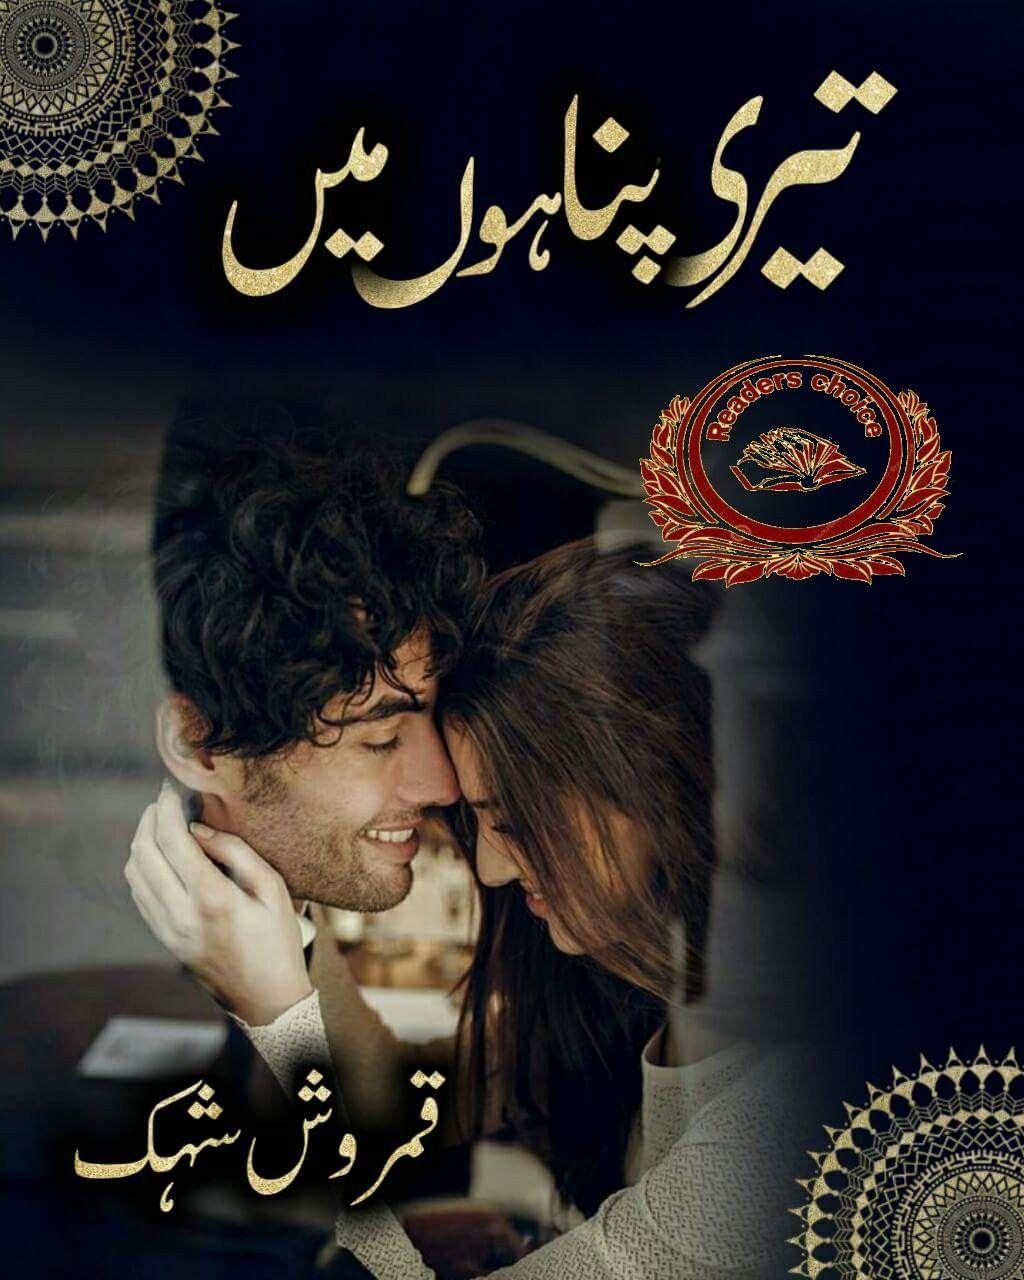 Teri panahon mein aa kar novel by Qamrosh Shehk | Prime Urdu